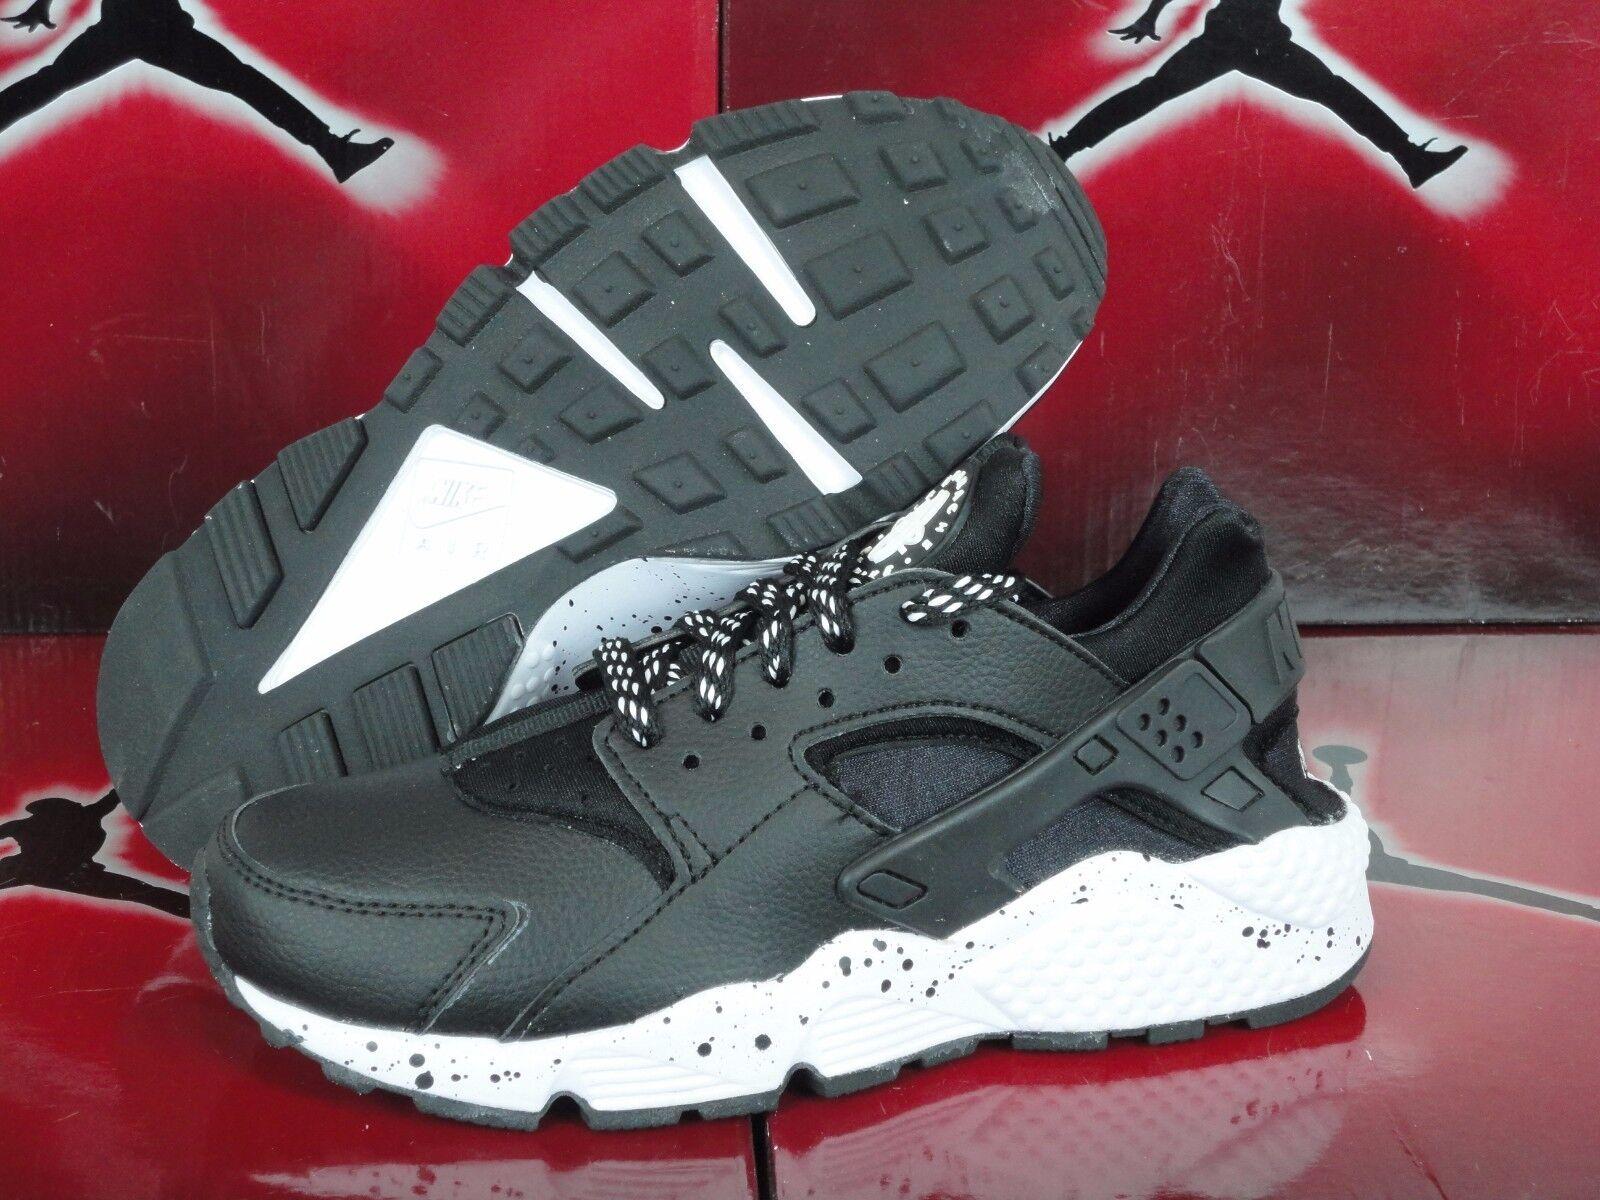 Nike - air huarache lauf prm sz sz sz 6 frauen schwarz - grau - weißen nikeid 0cb17e